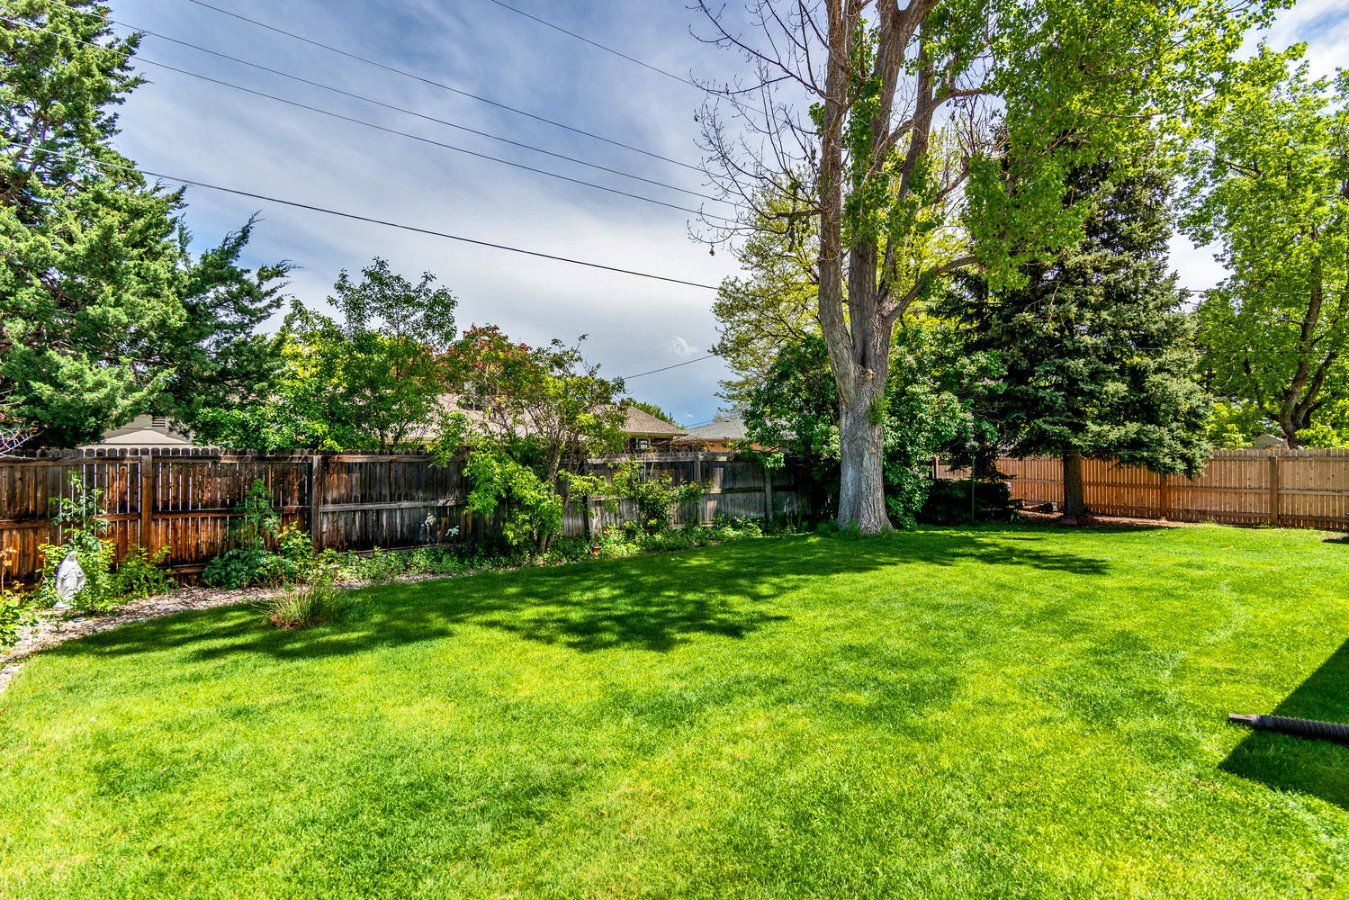 Fabulous Back Yard in a Nice Family Neighborhood